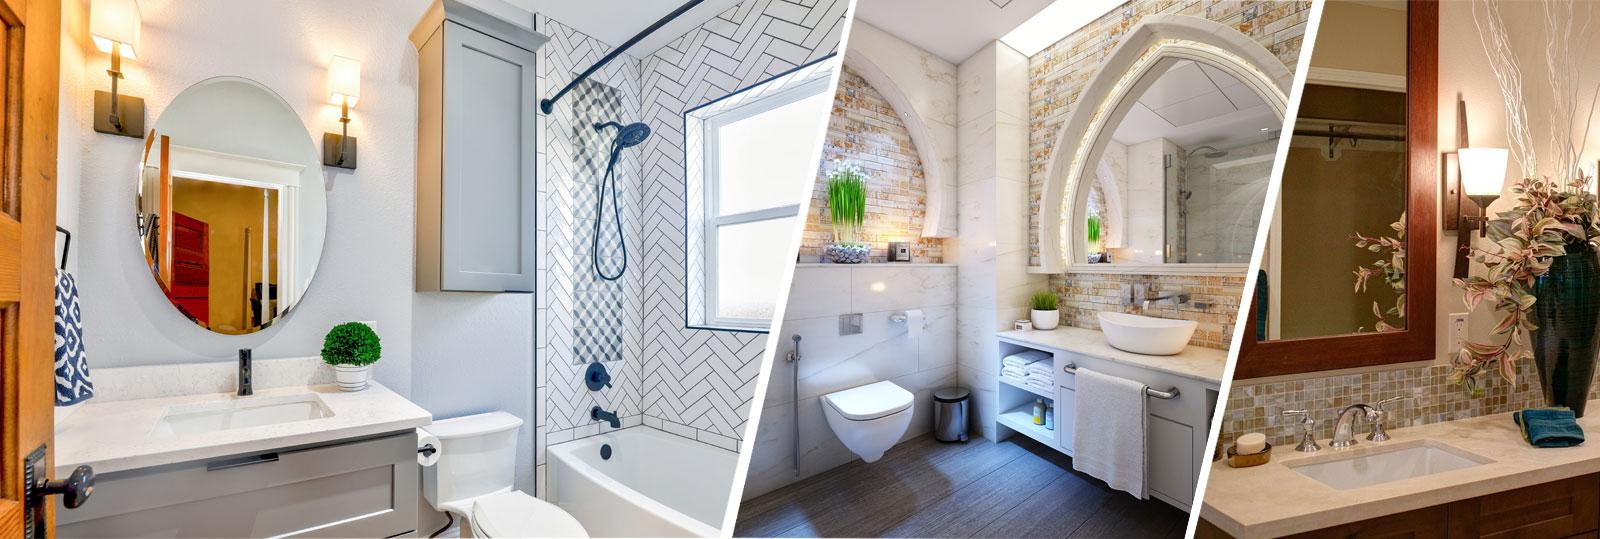 Bathroom Remodeling San Diego CA, 858 788 3957   Get Quote